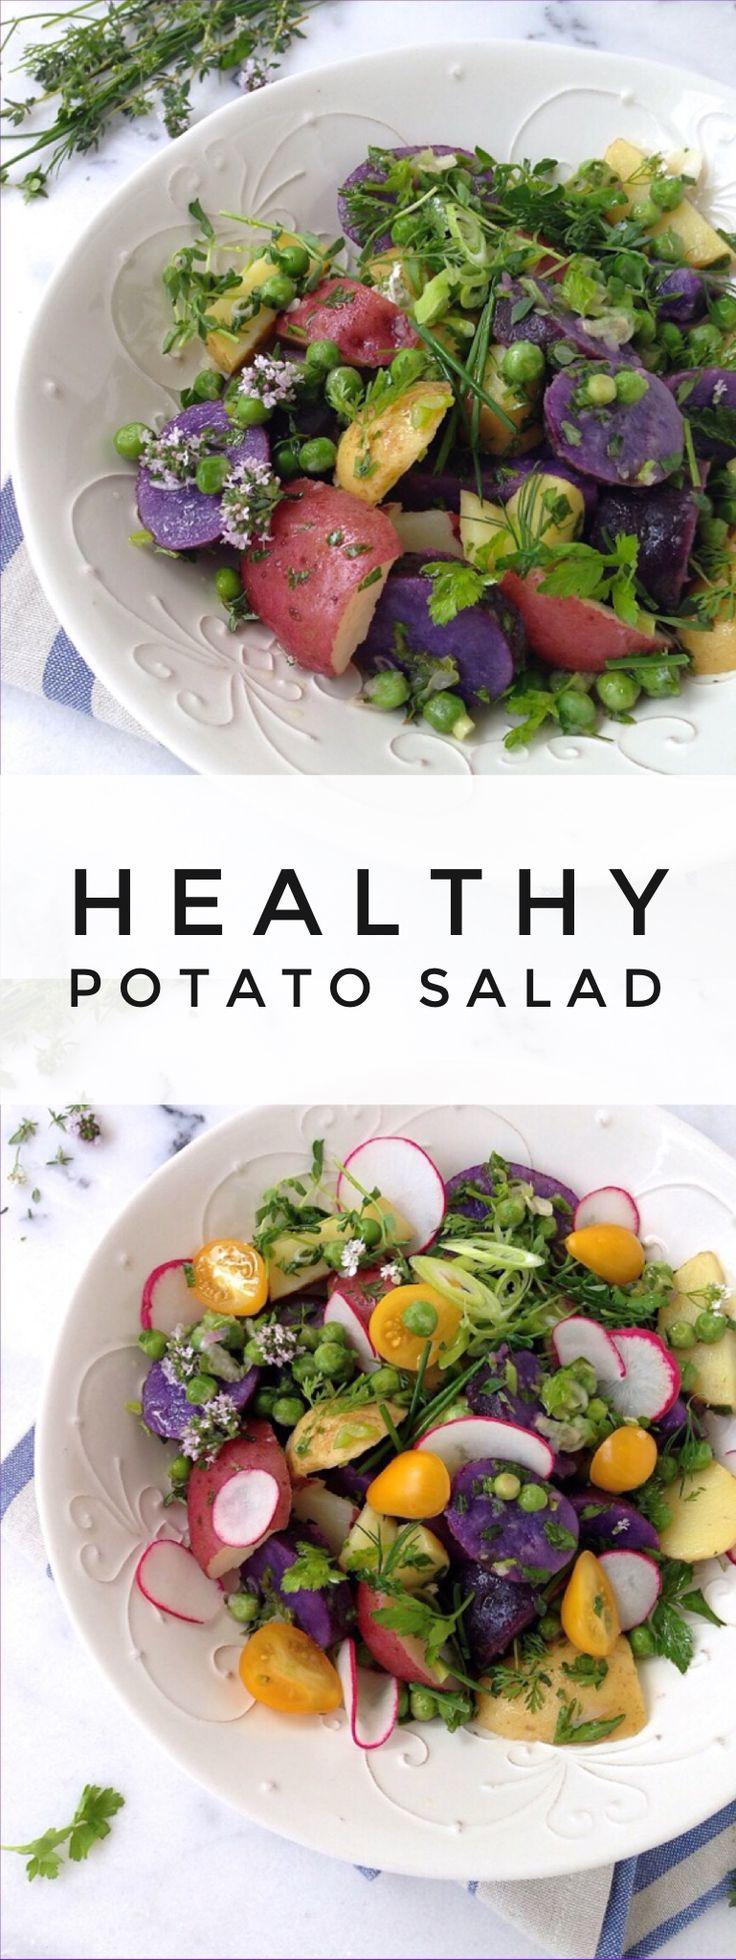 Healthy Potato Salad Recipe  Best 25 Healthy potato salads ideas on Pinterest